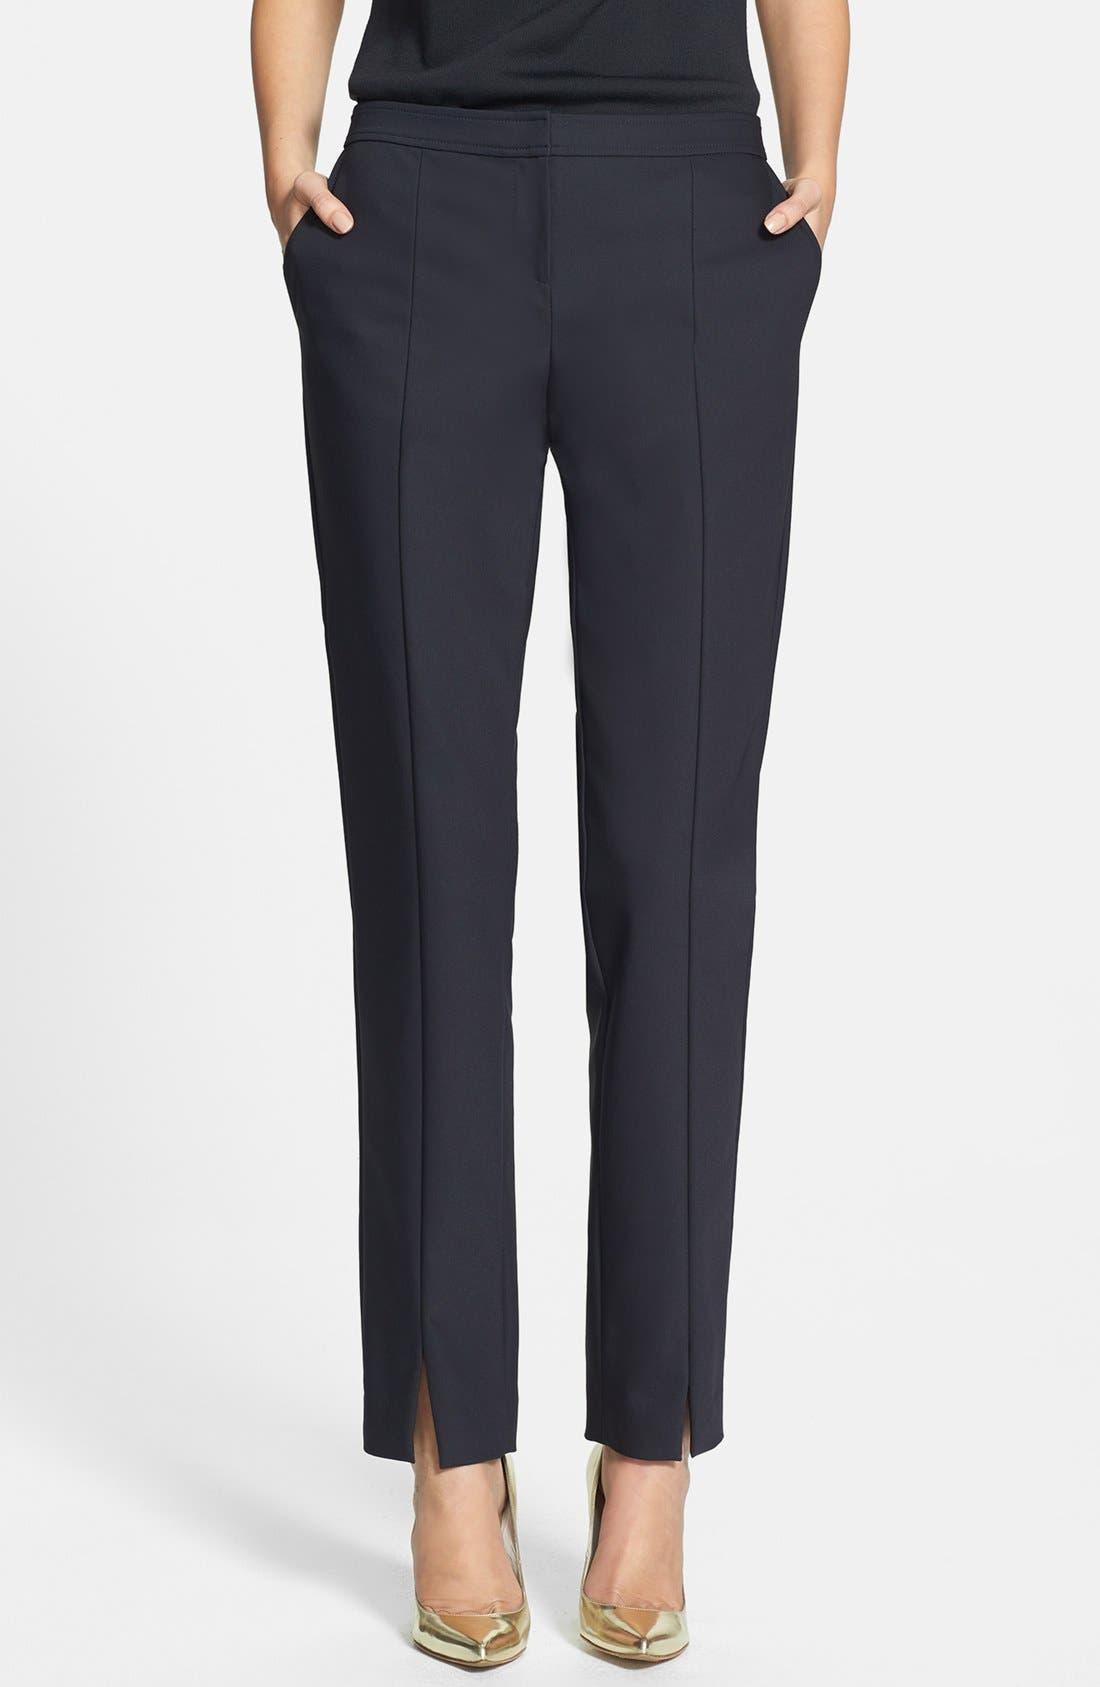 Alternate Image 1 Selected - St. John Collection 'Jennifer' Scuba Ankle Pants